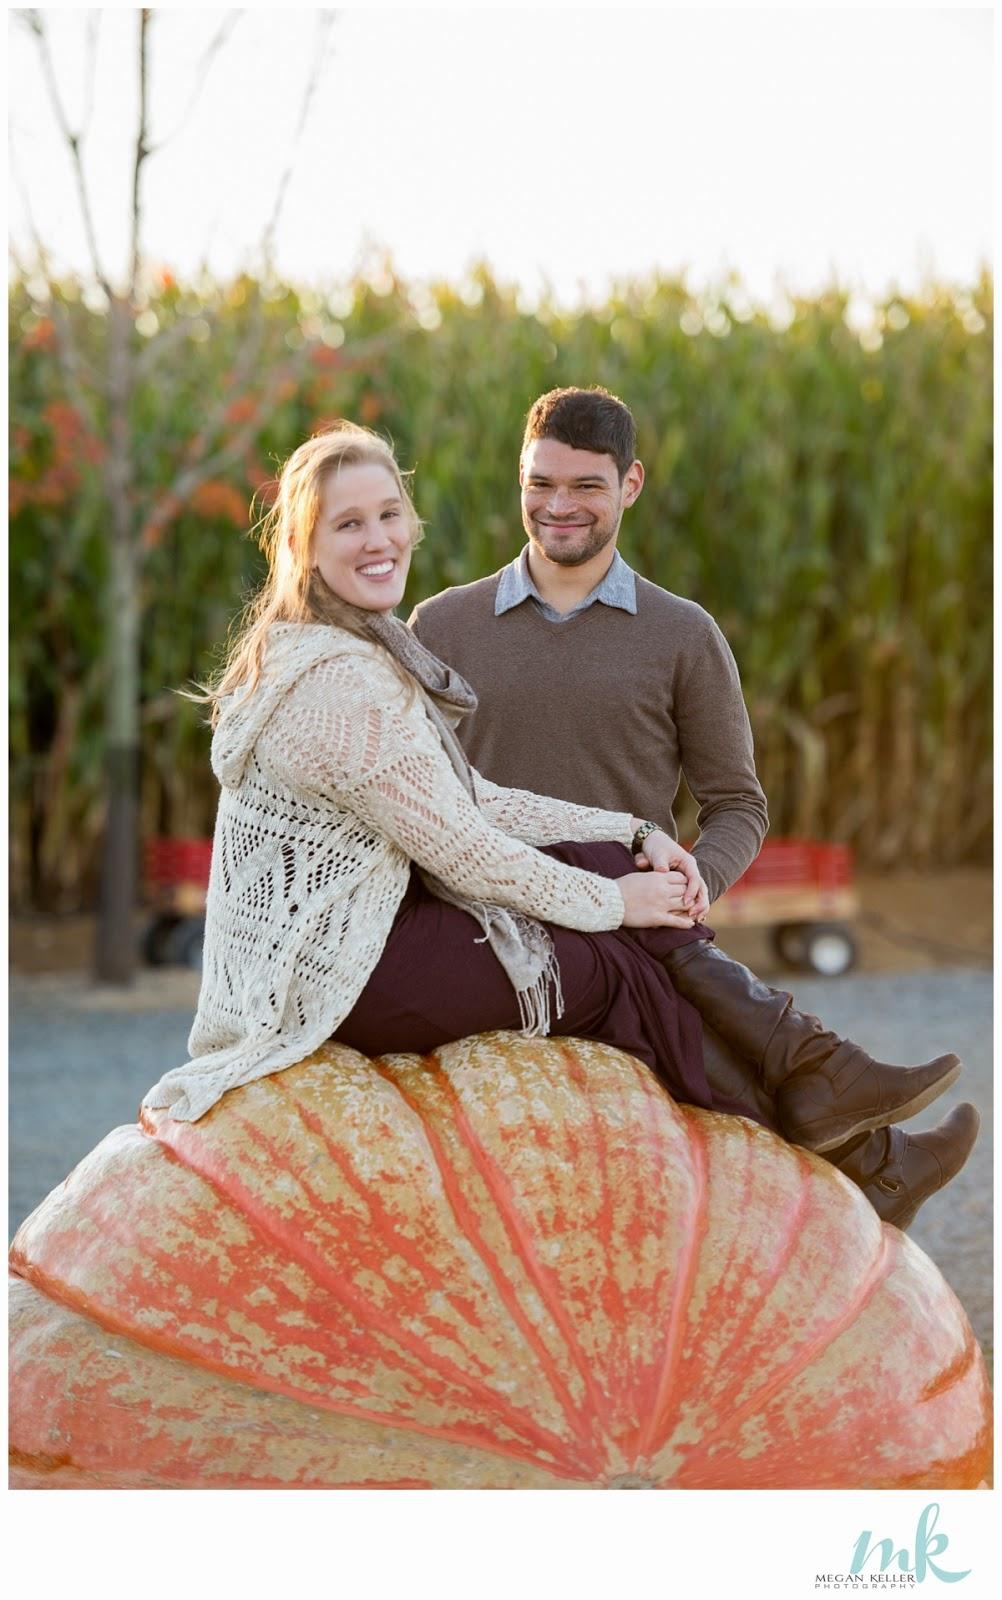 Bethany and Eli's Engagement Bethany and Eli's Engagement 2014 10 28 0020